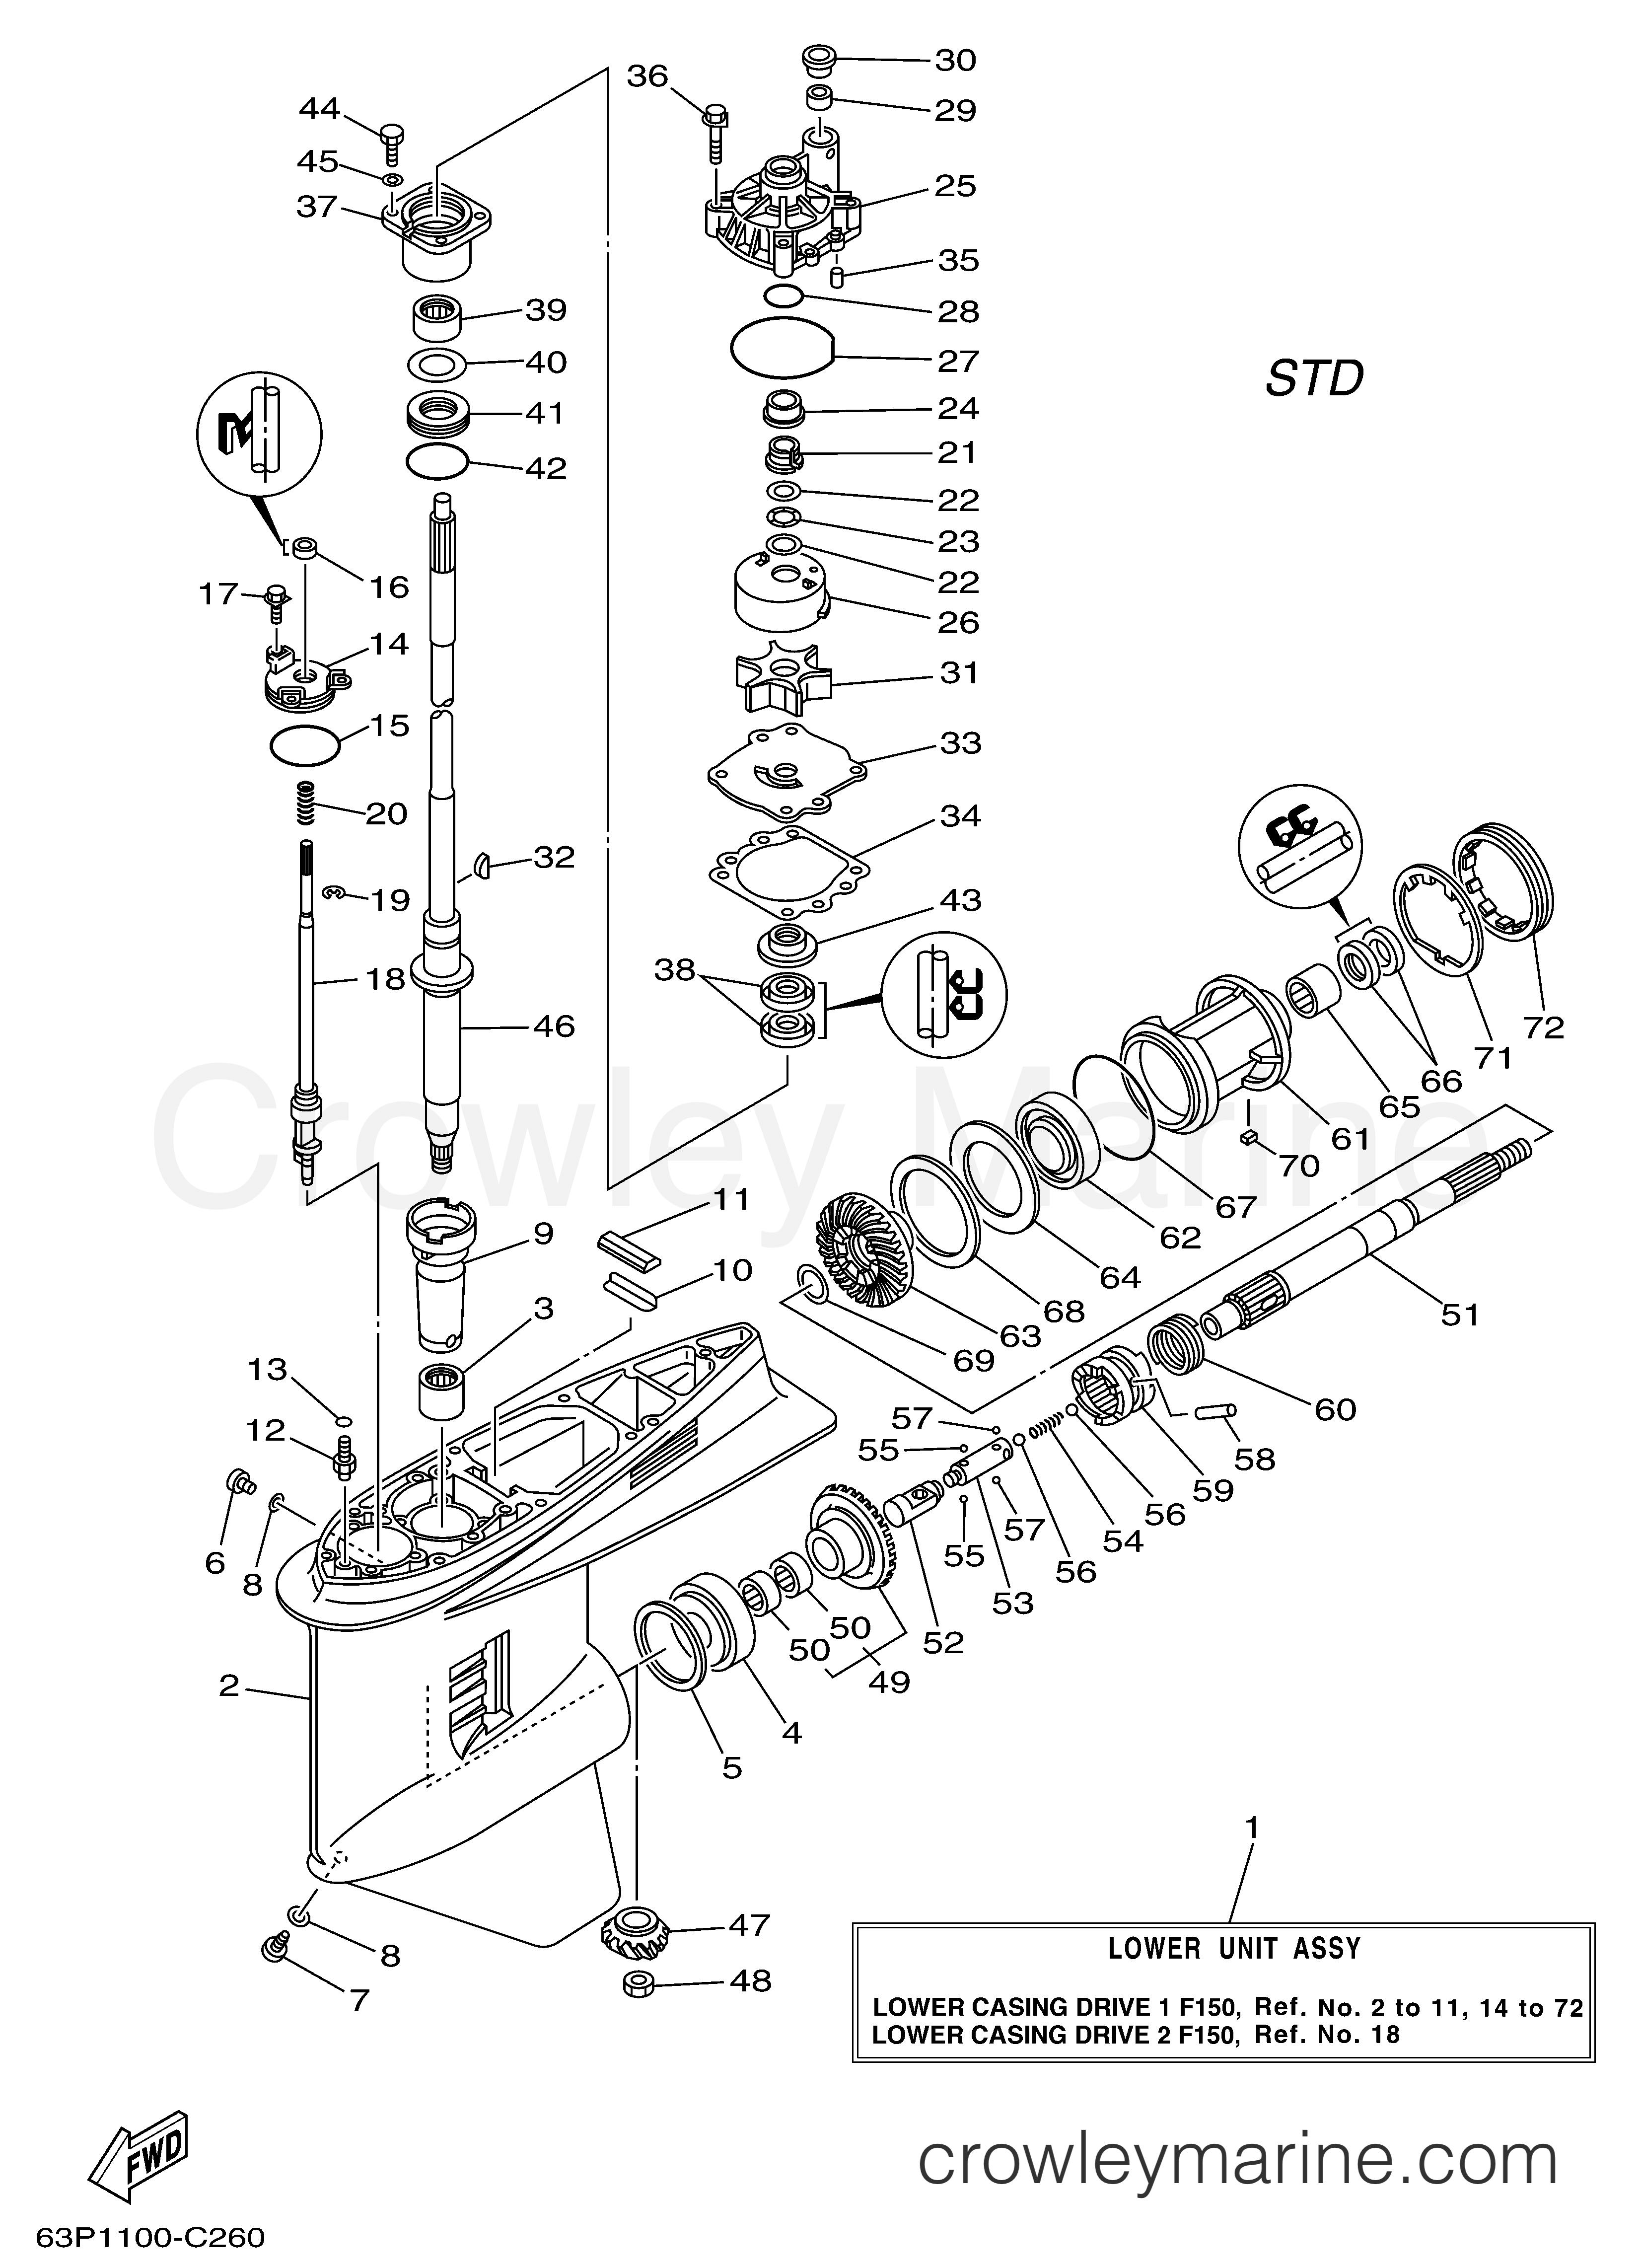 lower casing drive 1 f150